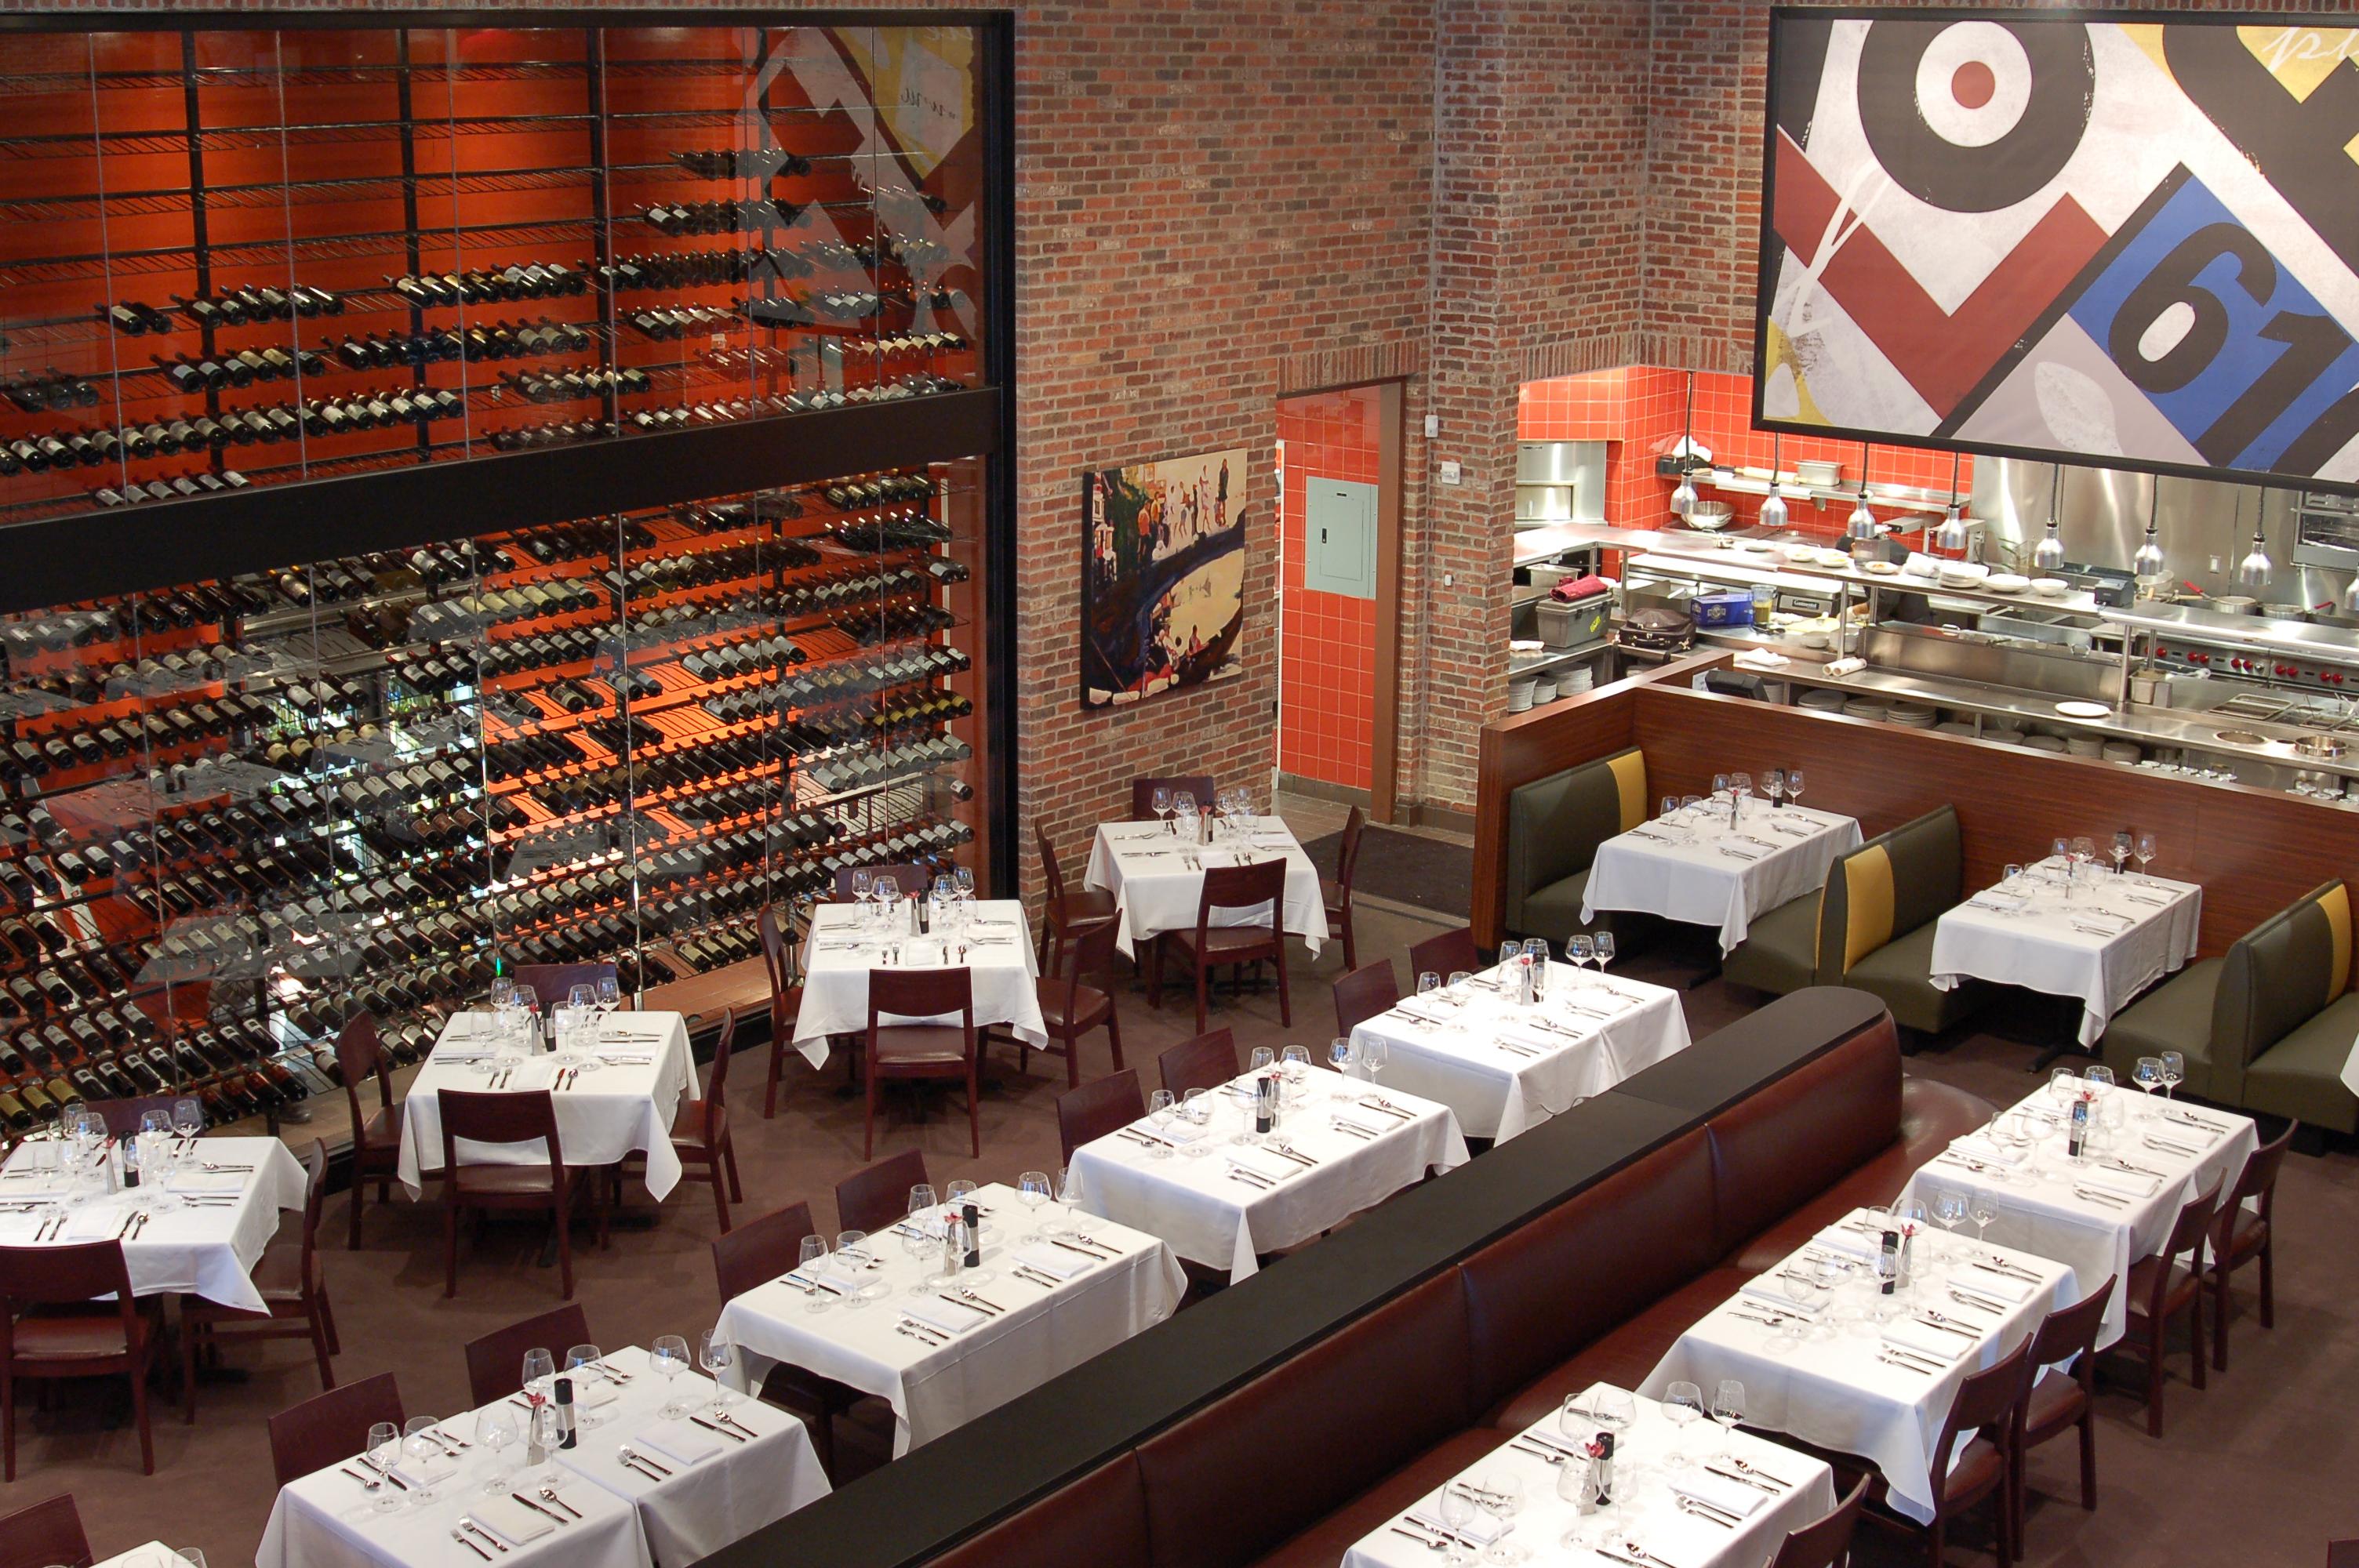 loft 610 urban restaurant lounge announces opening in. Black Bedroom Furniture Sets. Home Design Ideas